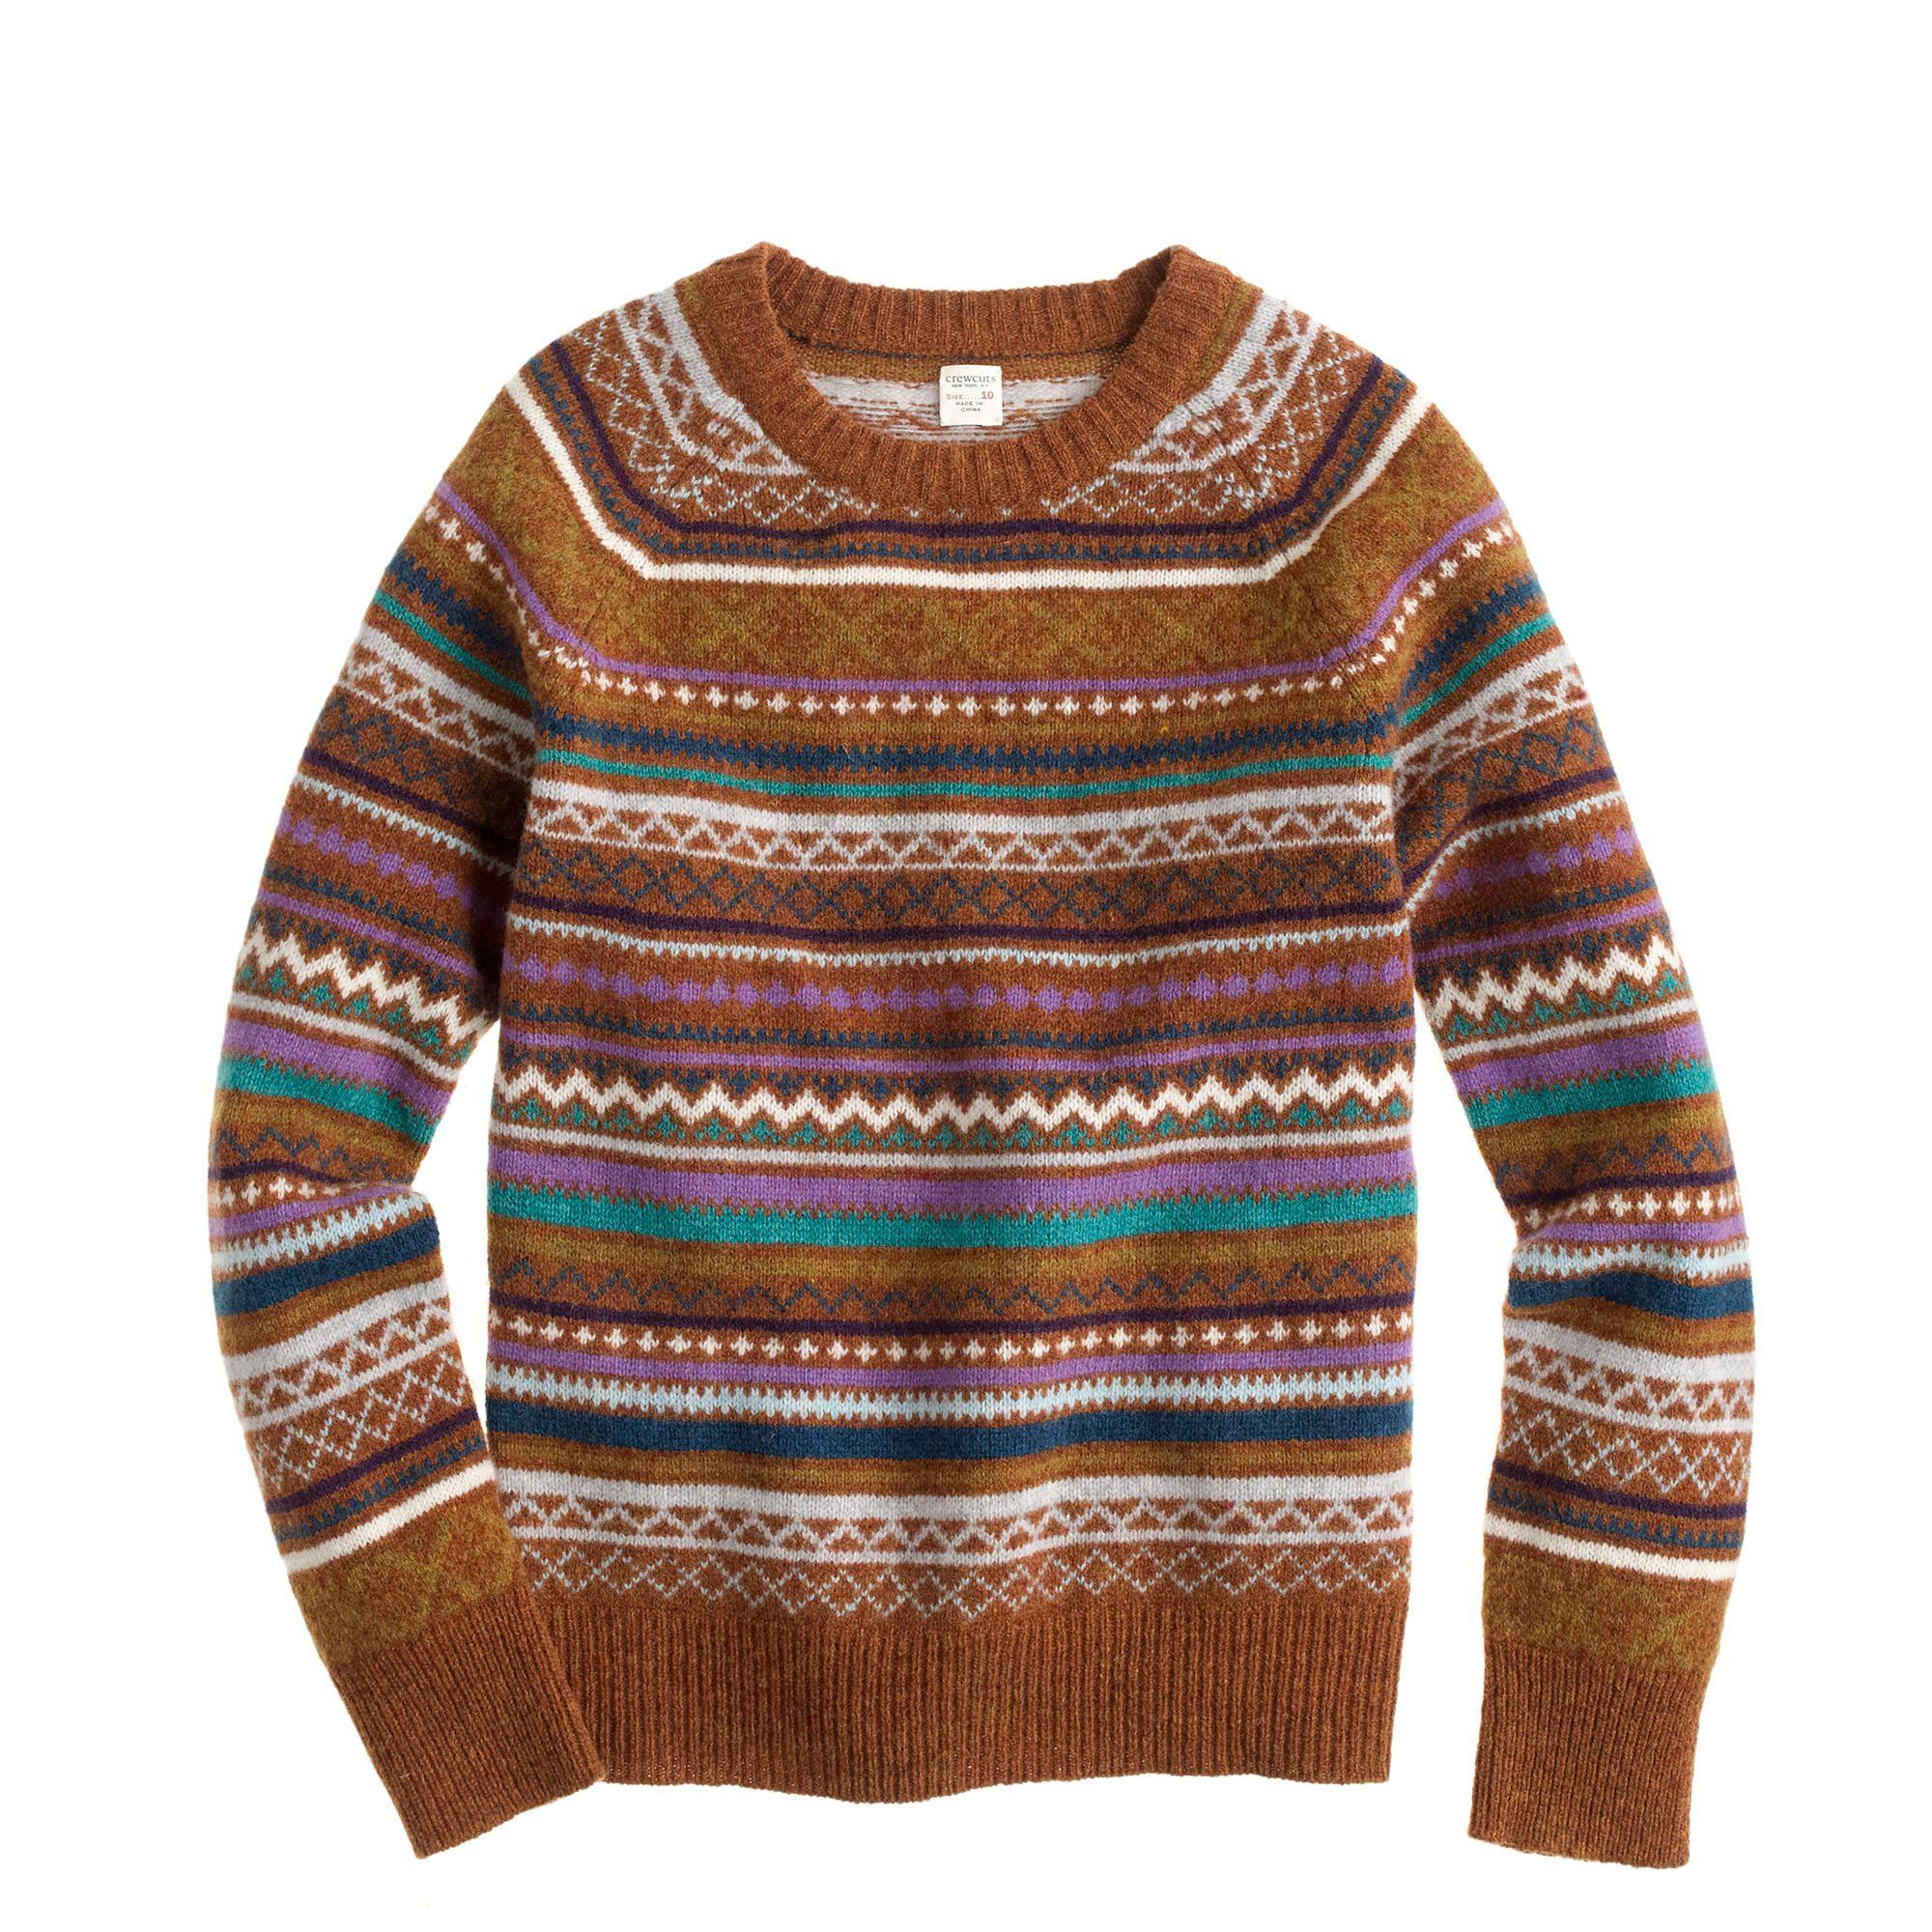 Boys' lambswool Fair Isle sweater : crewnecks & shawls | J.Crew ...